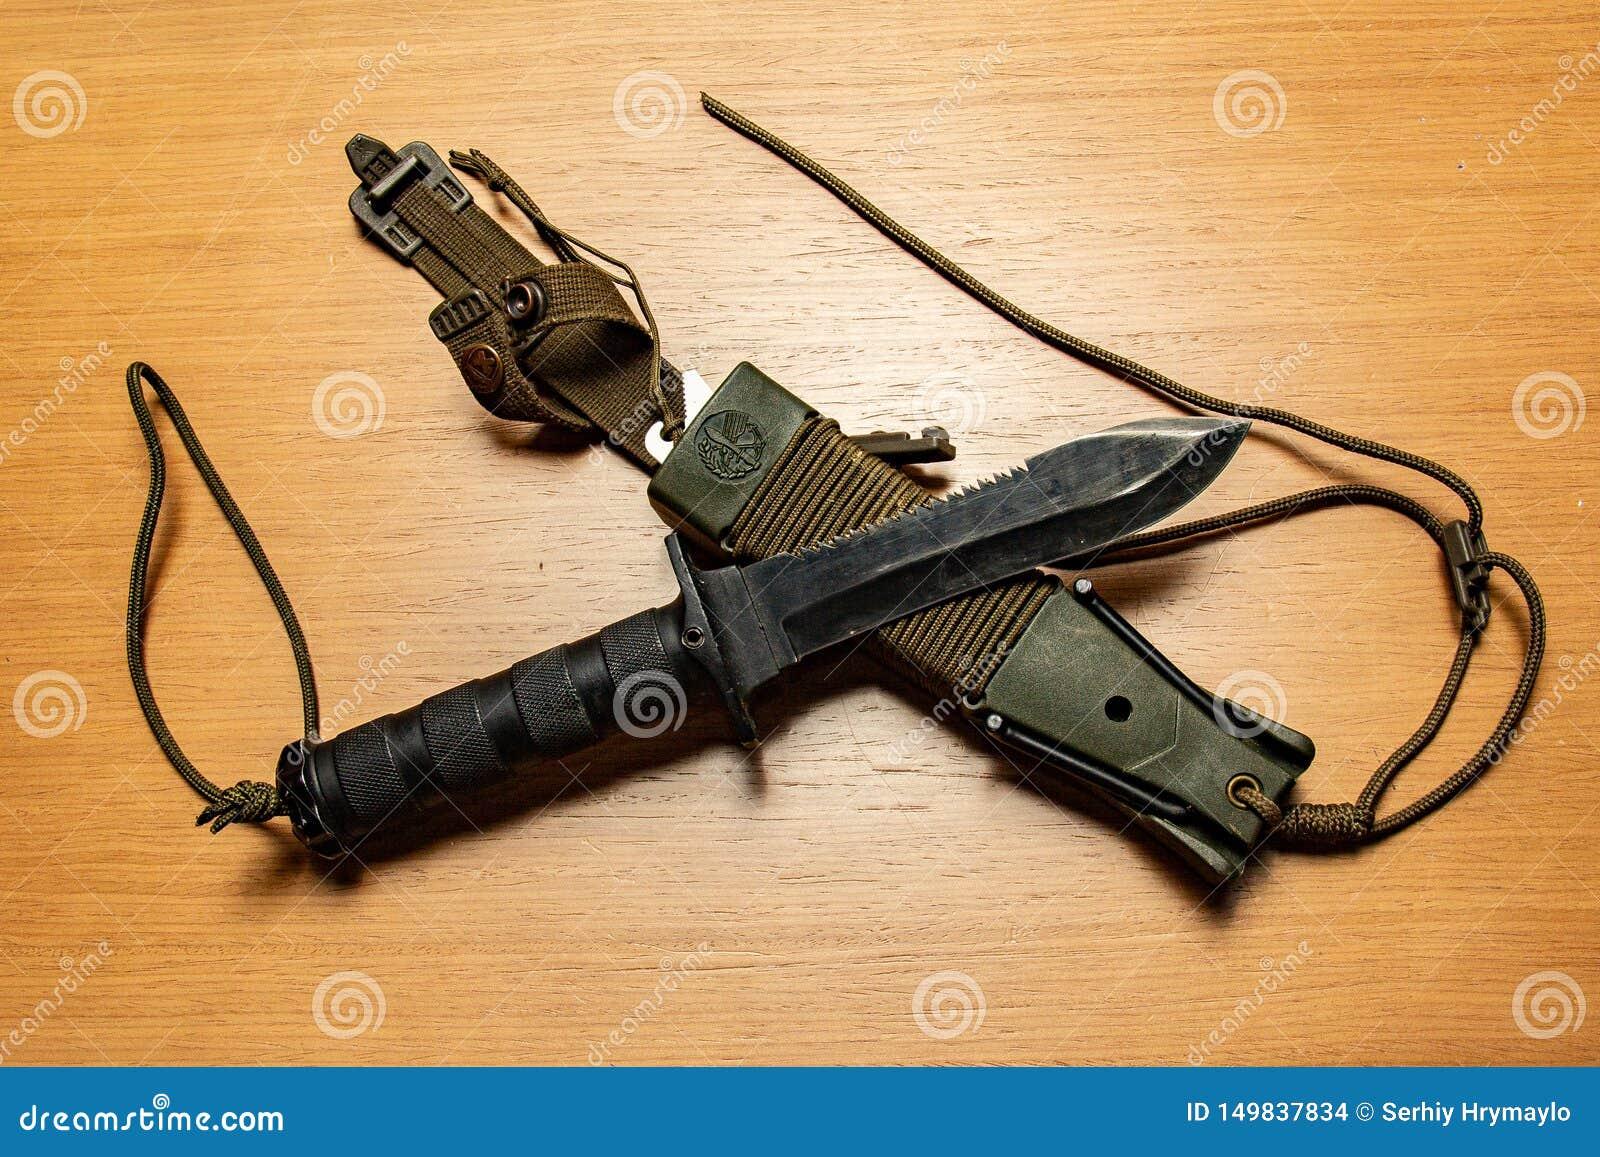 Caçando ou faca de pesca